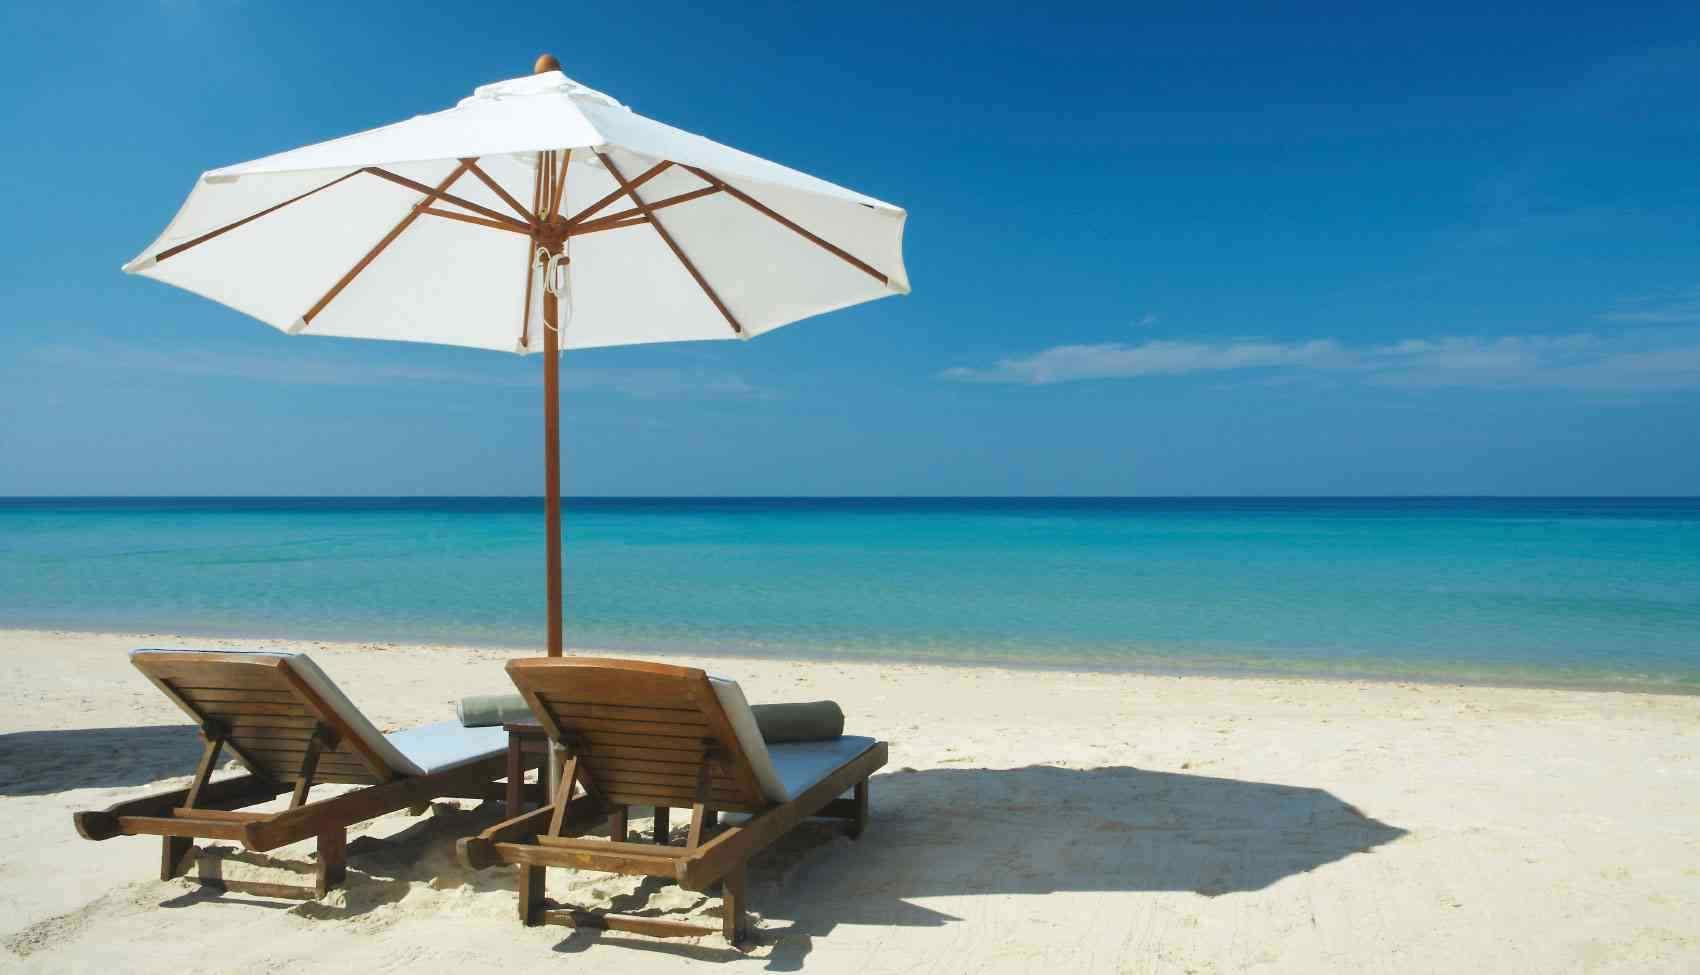 Holiday Abroad Checklist